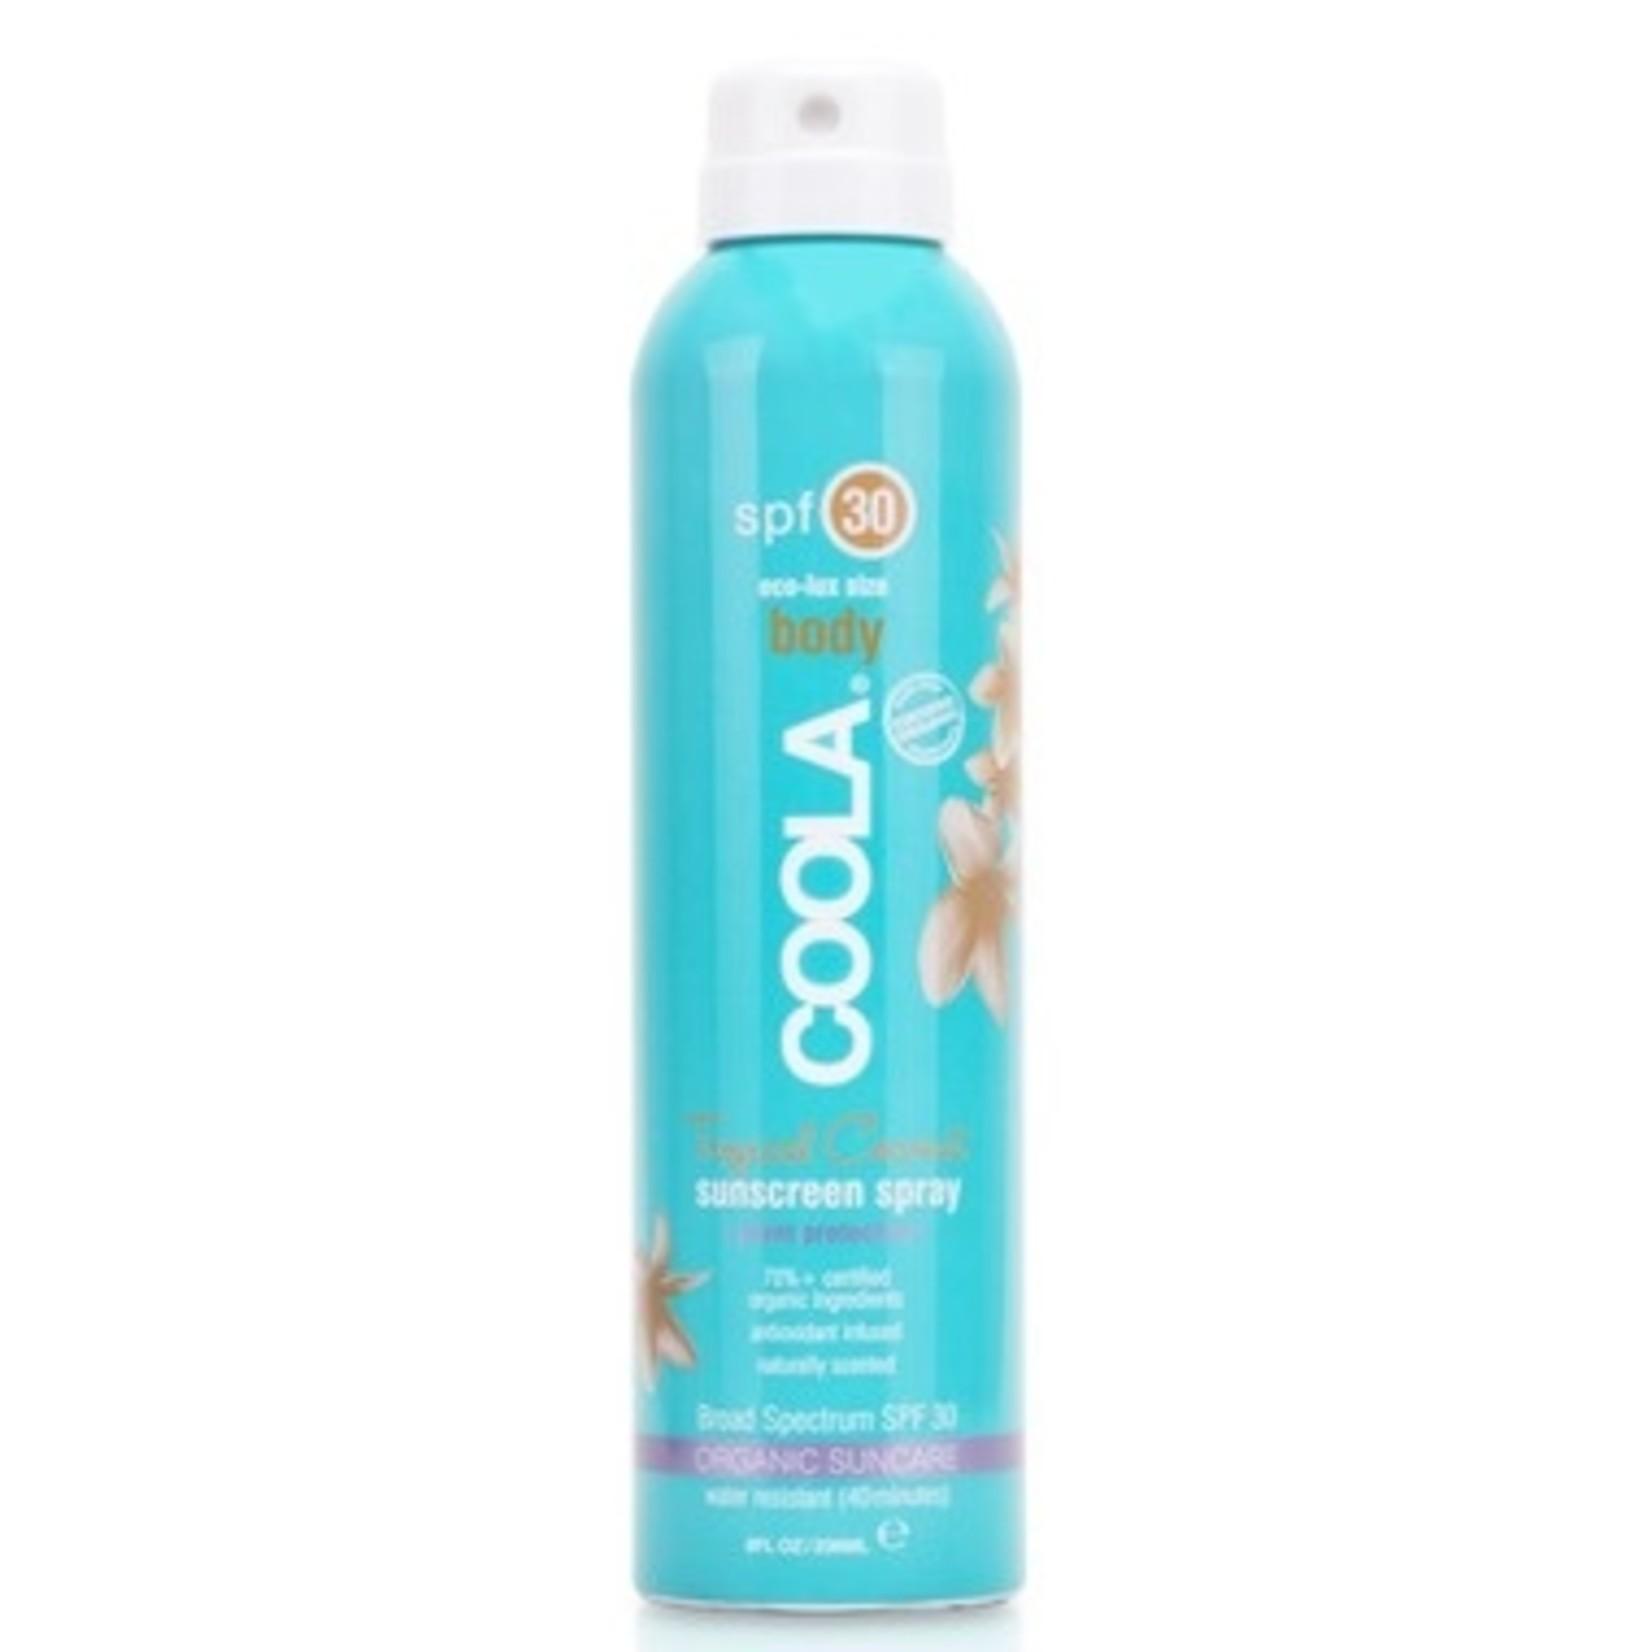 Coola Spray coconut SPF 30